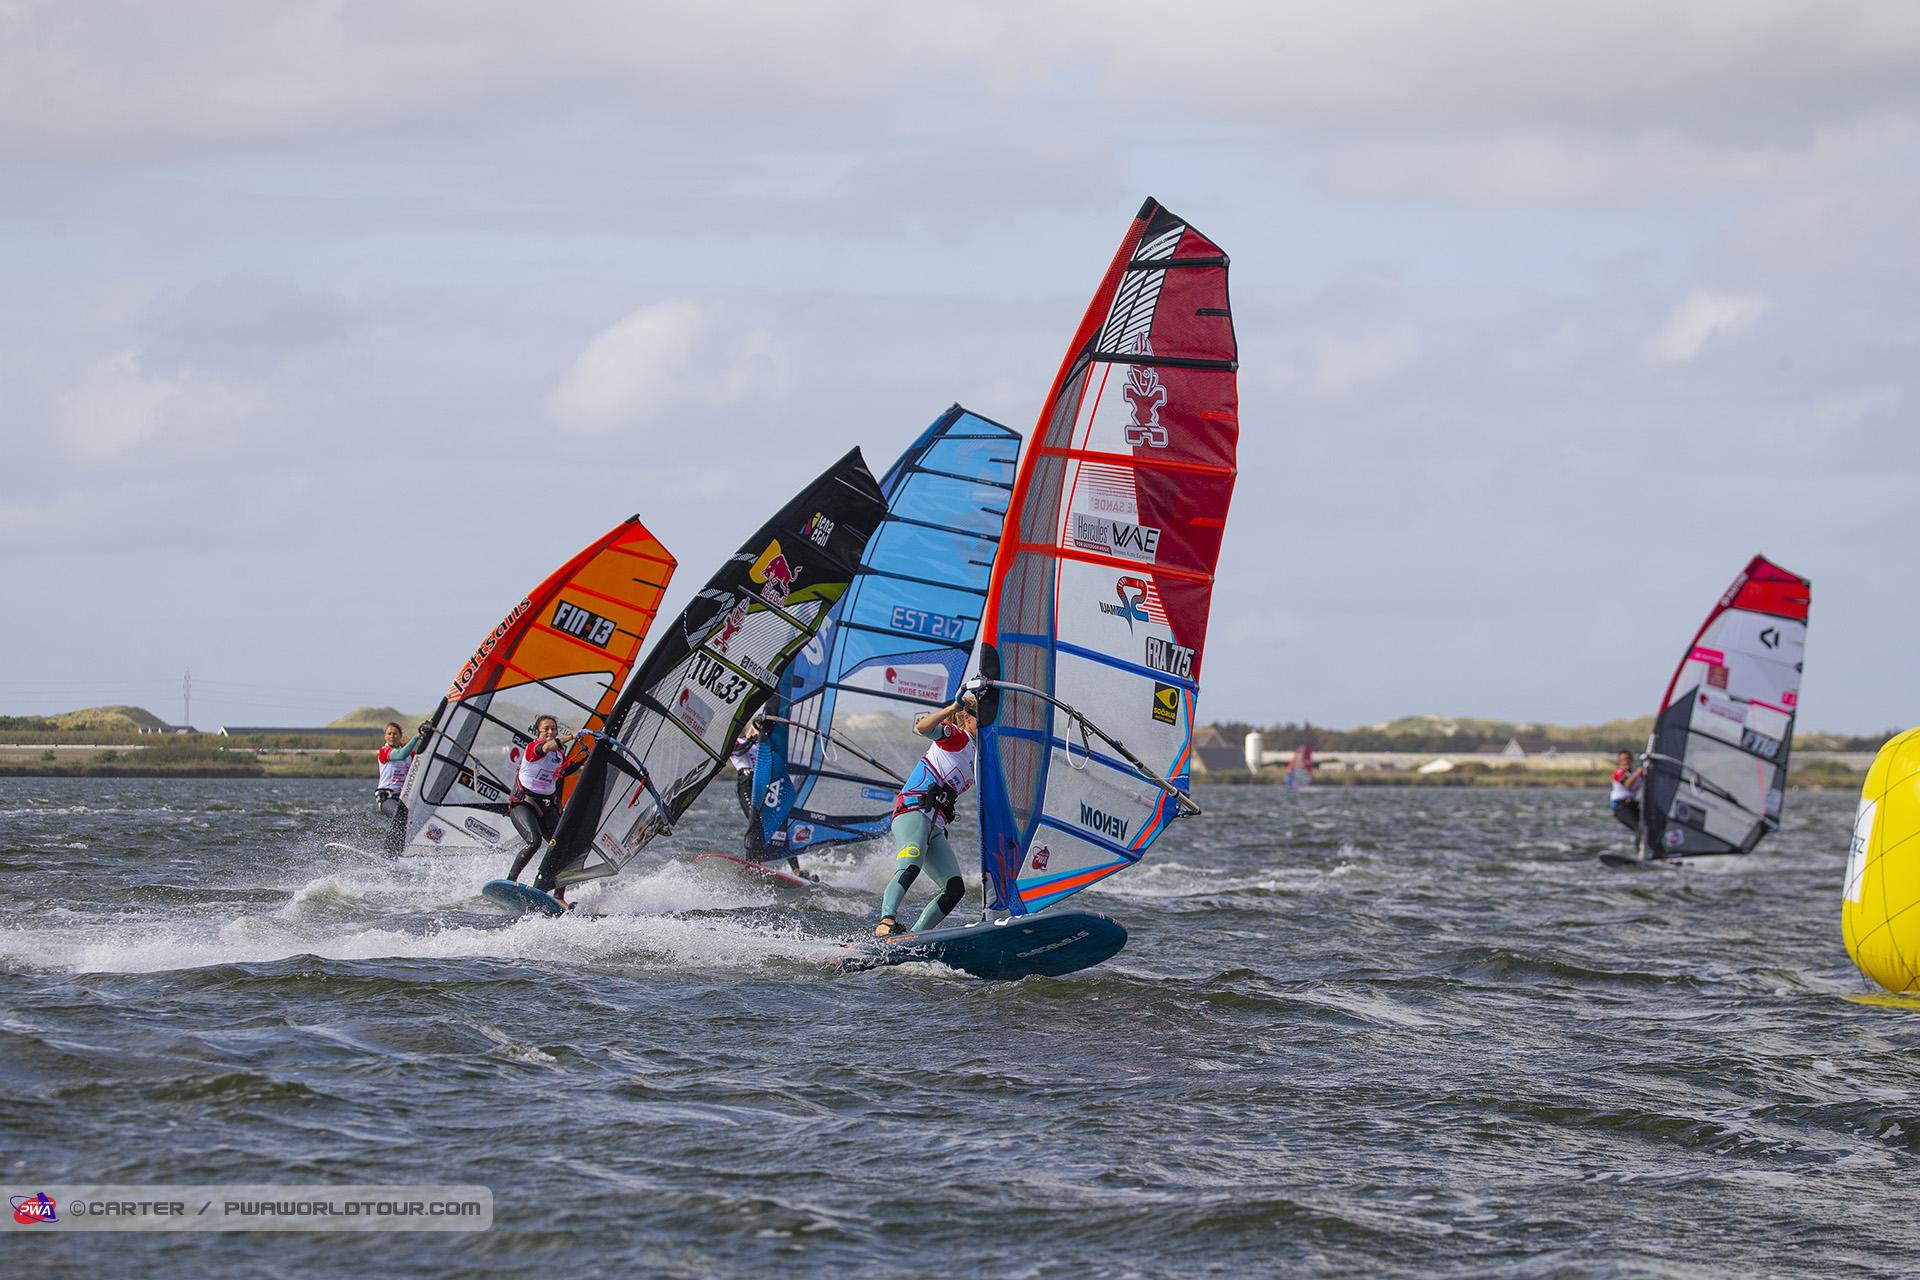 HV19_sl_Delphine_leads_race_6.jpg